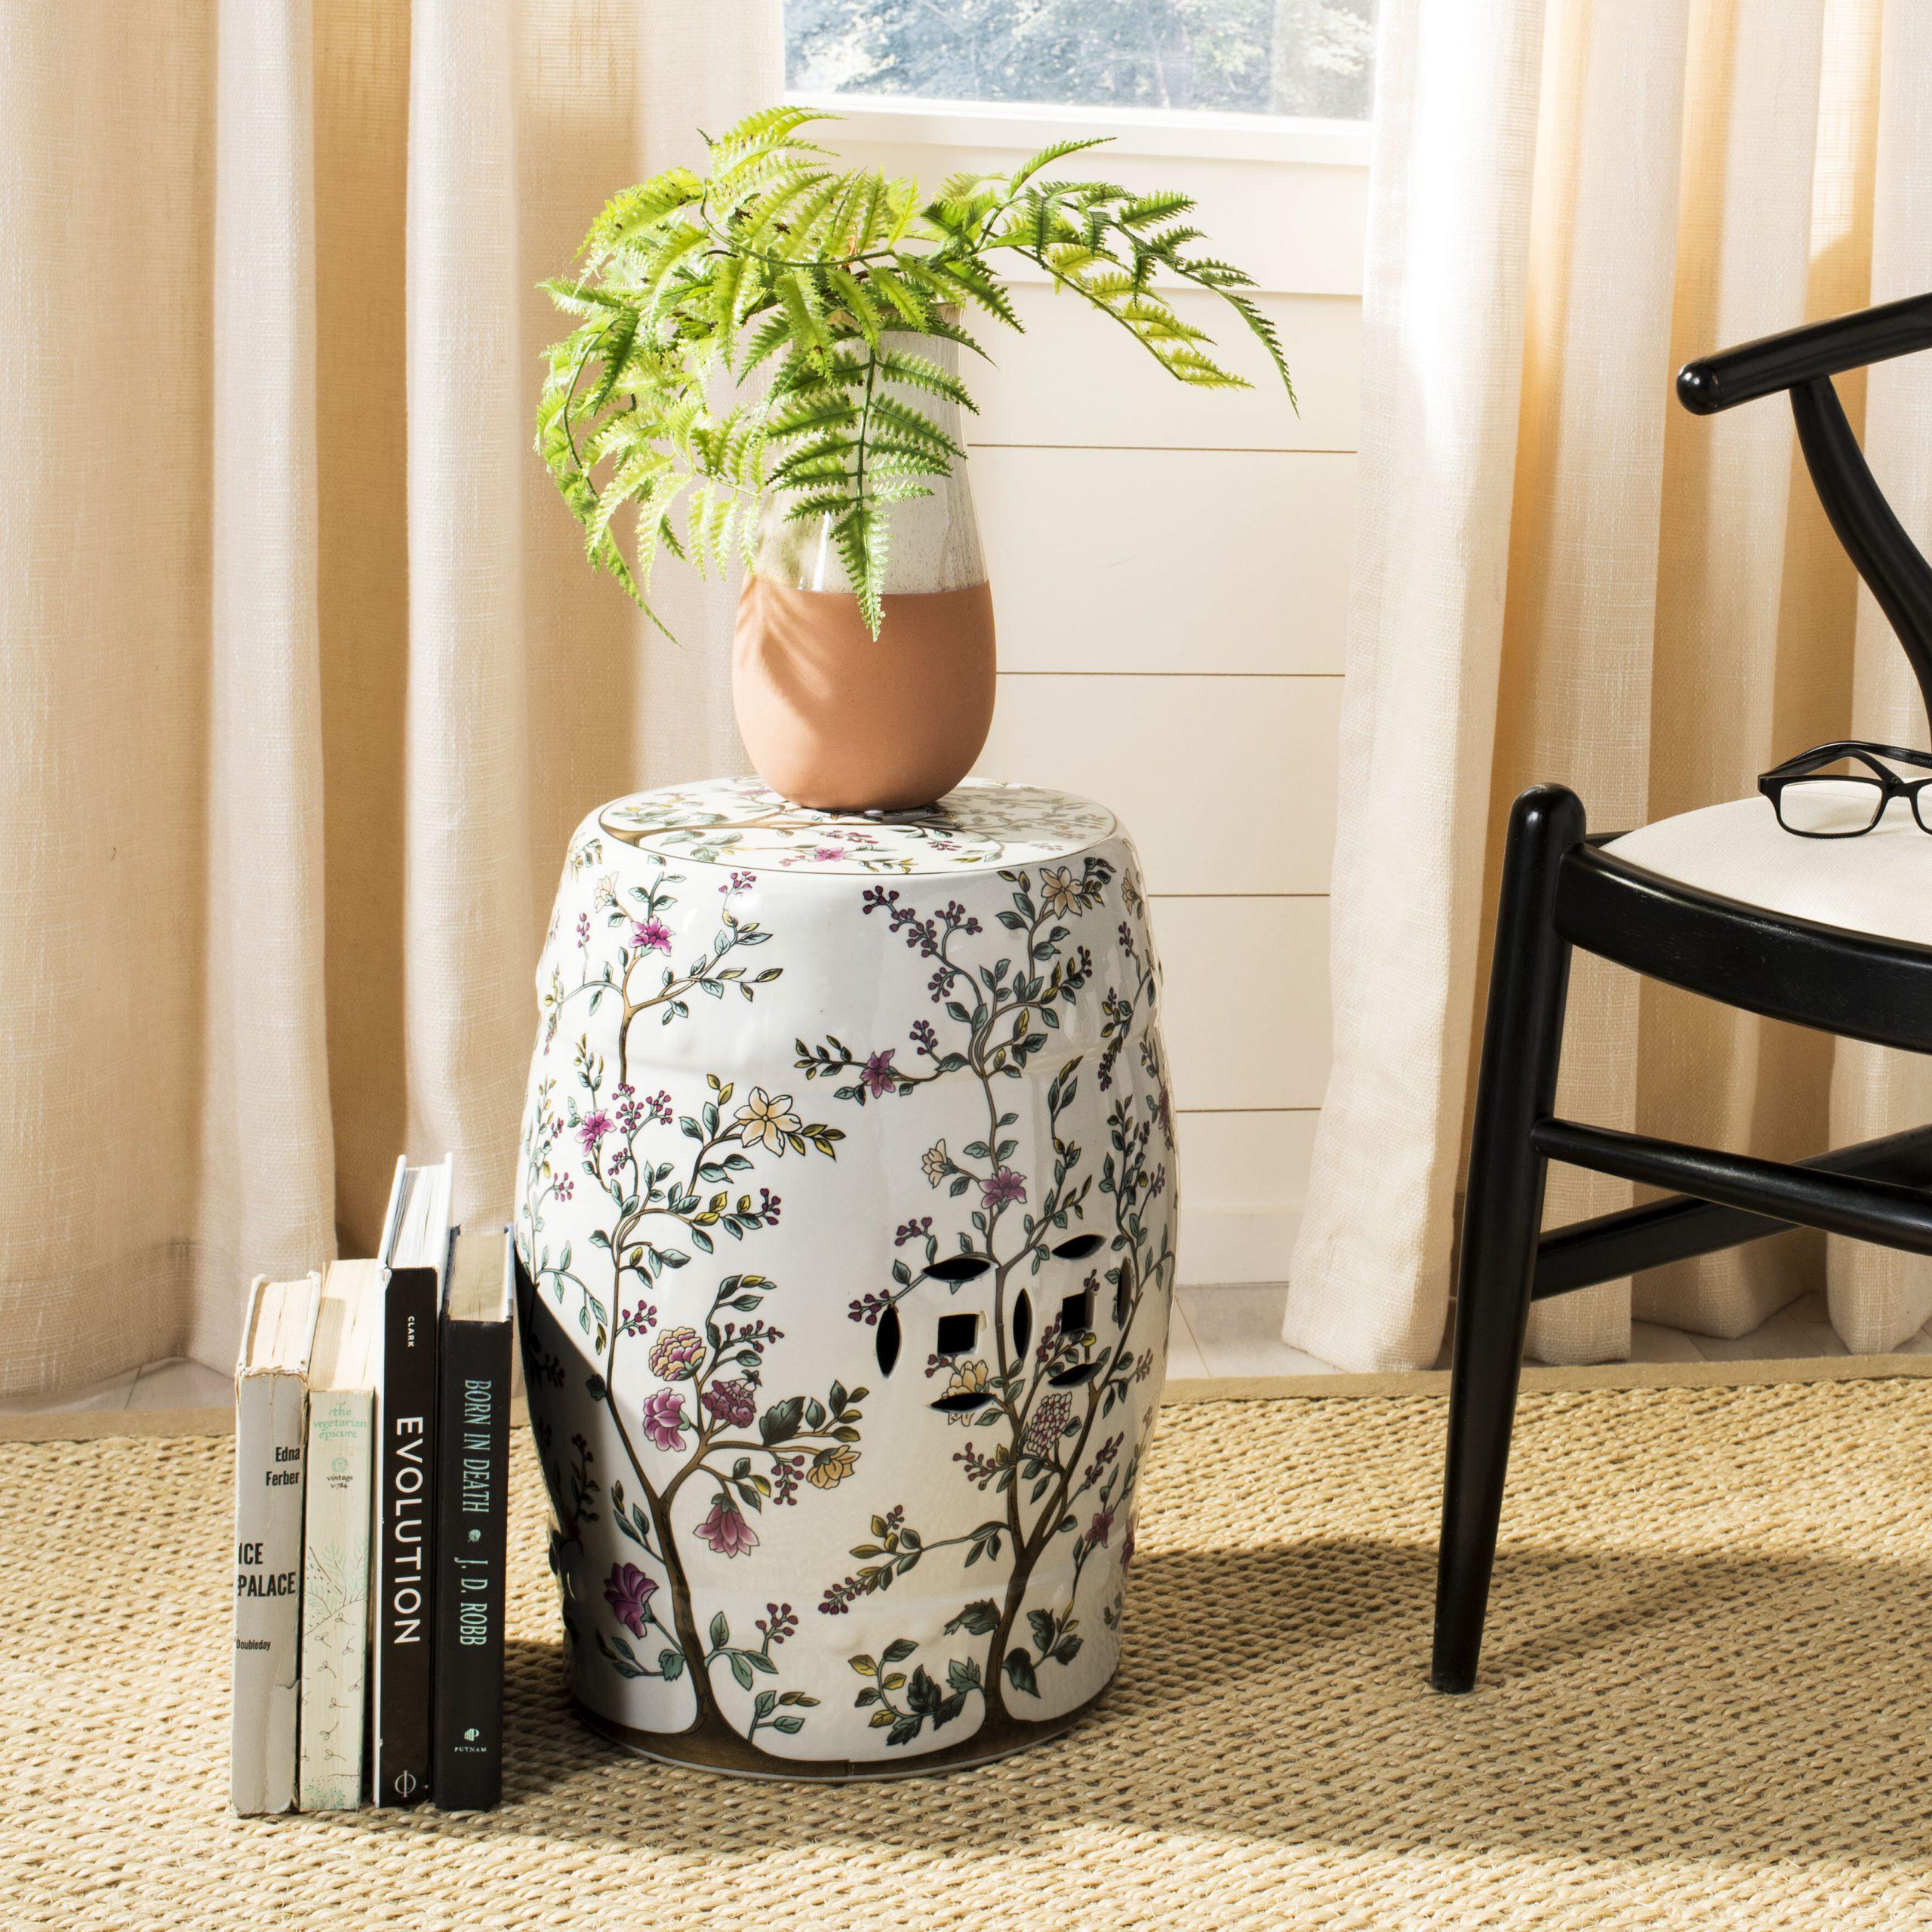 Ceramic Garden Accent Stools You'Ll Love In 2020 | Wayfair With Engelhardt Ceramic Garden Stools (View 18 of 25)